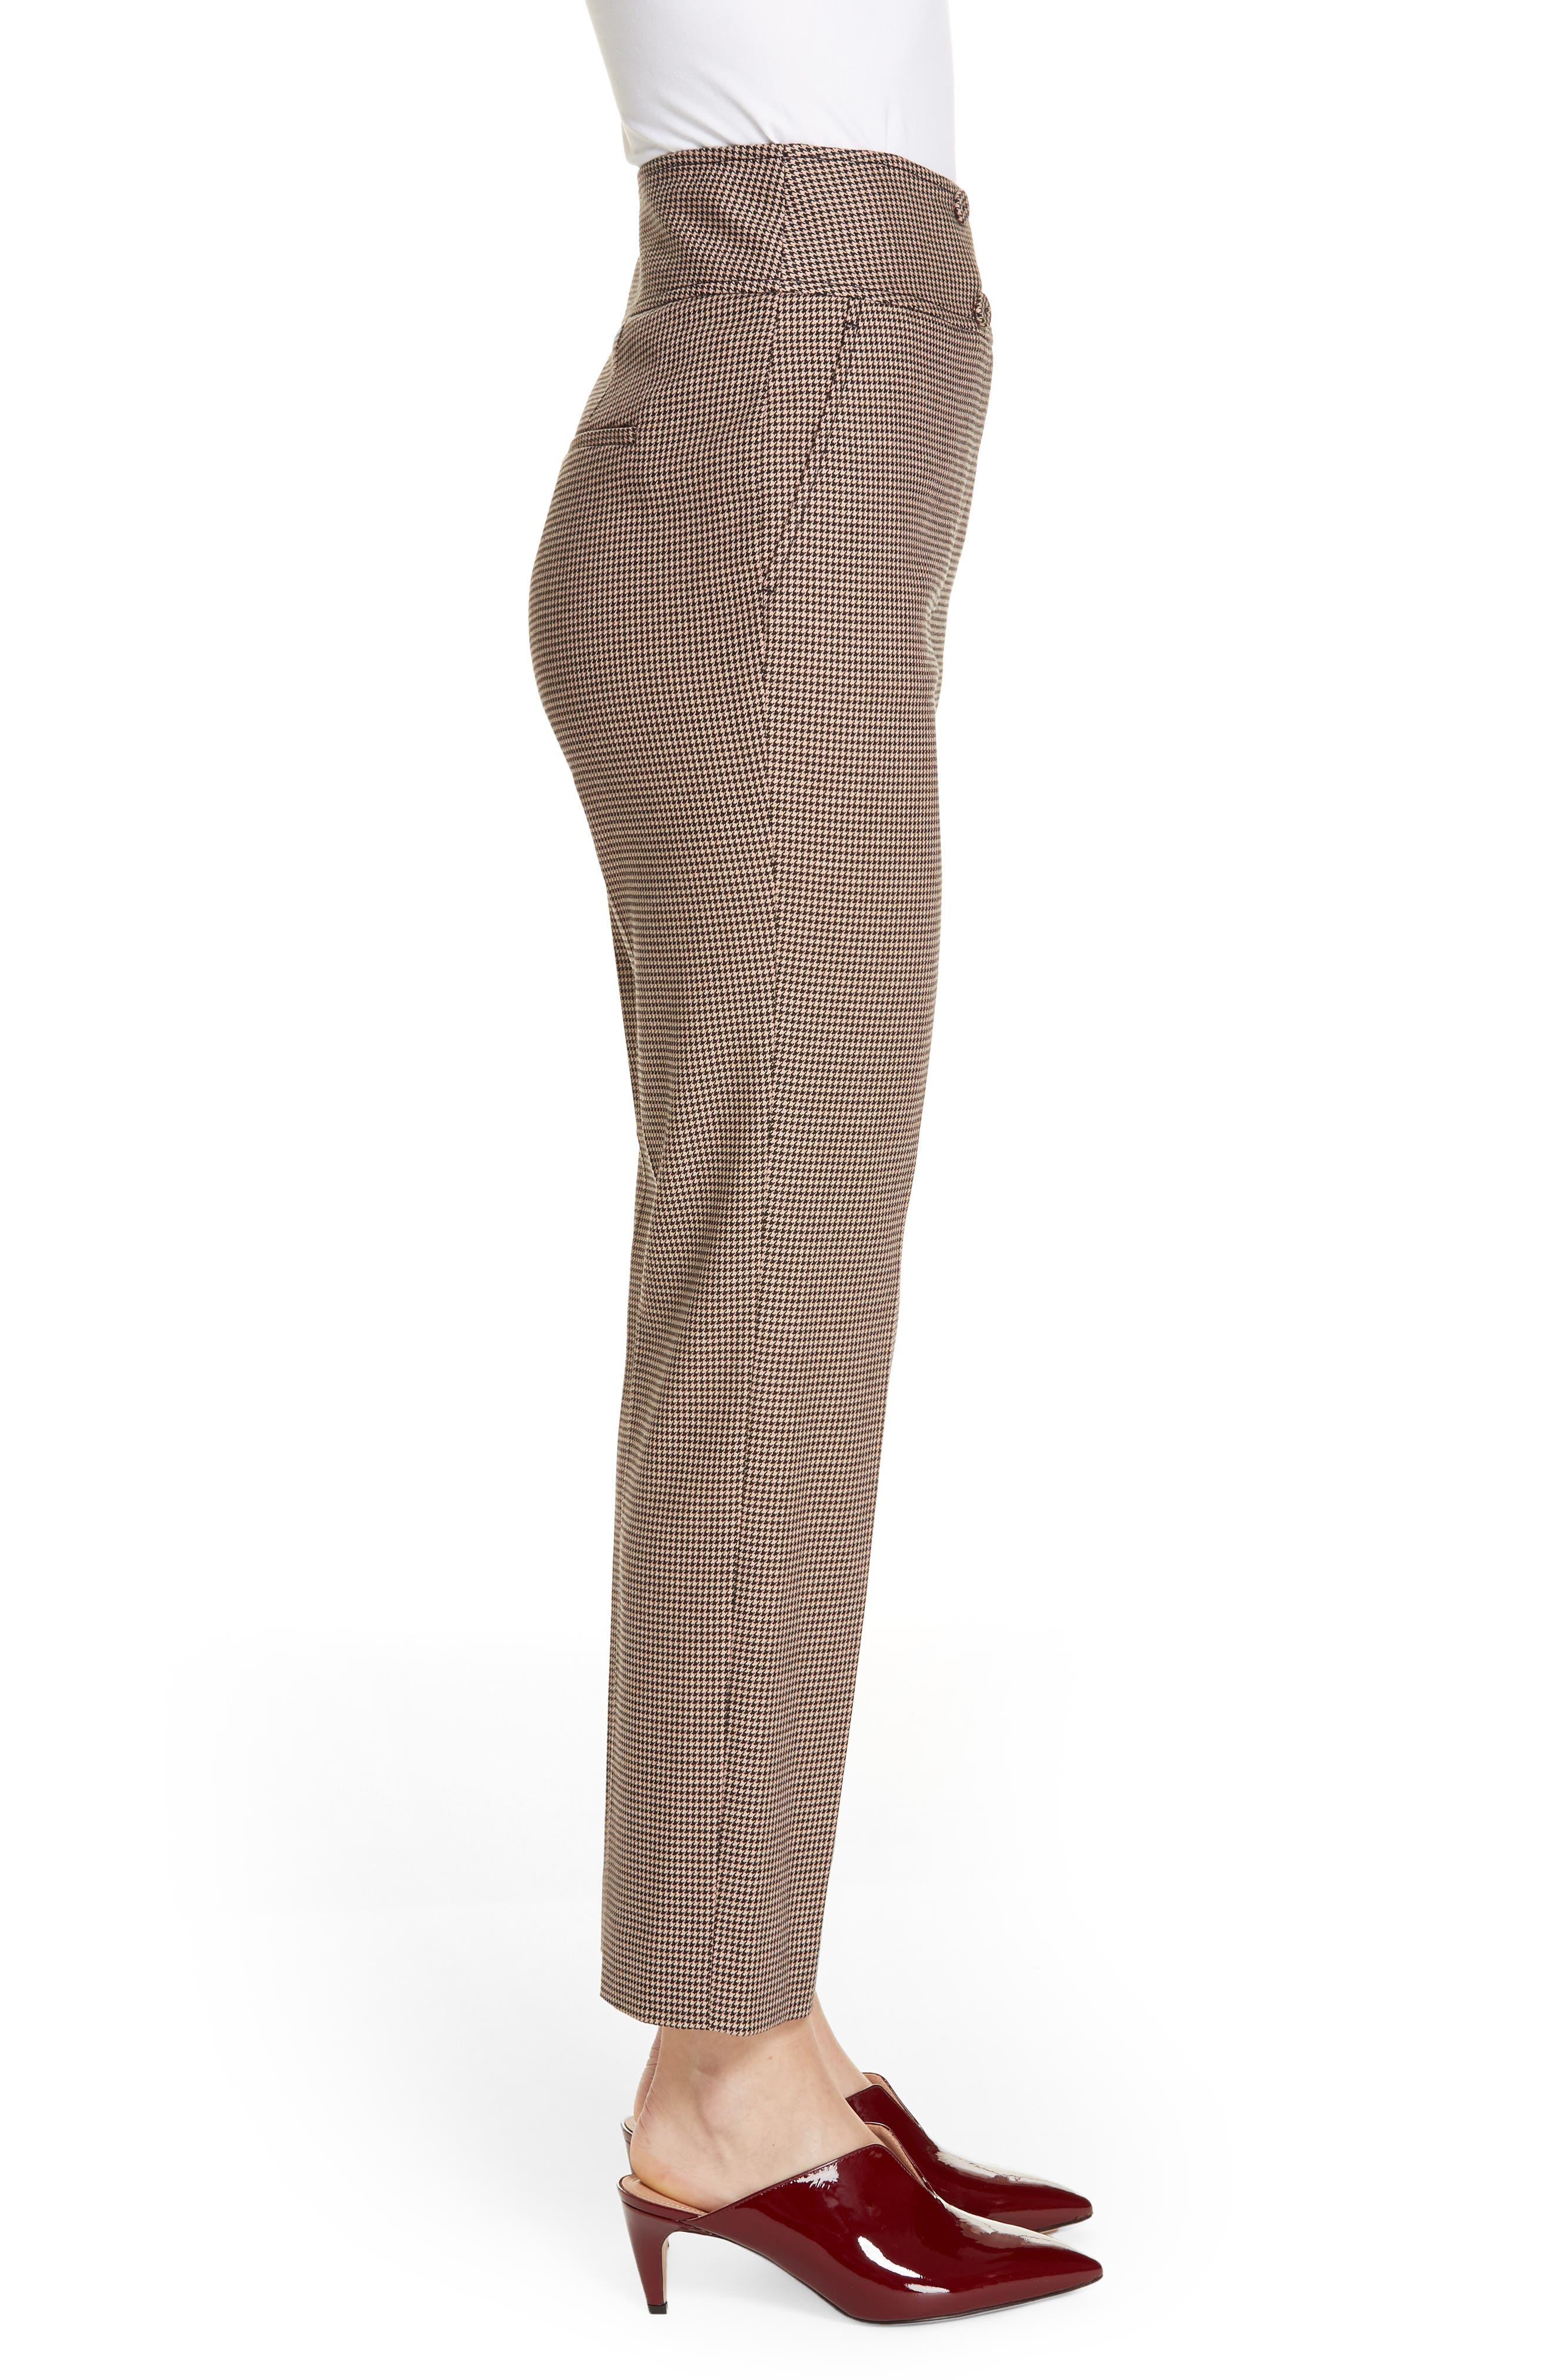 Houndstooth Check Stretch Cotton Blend Pants,                             Alternate thumbnail 3, color,                             CAMEL/ BLACK